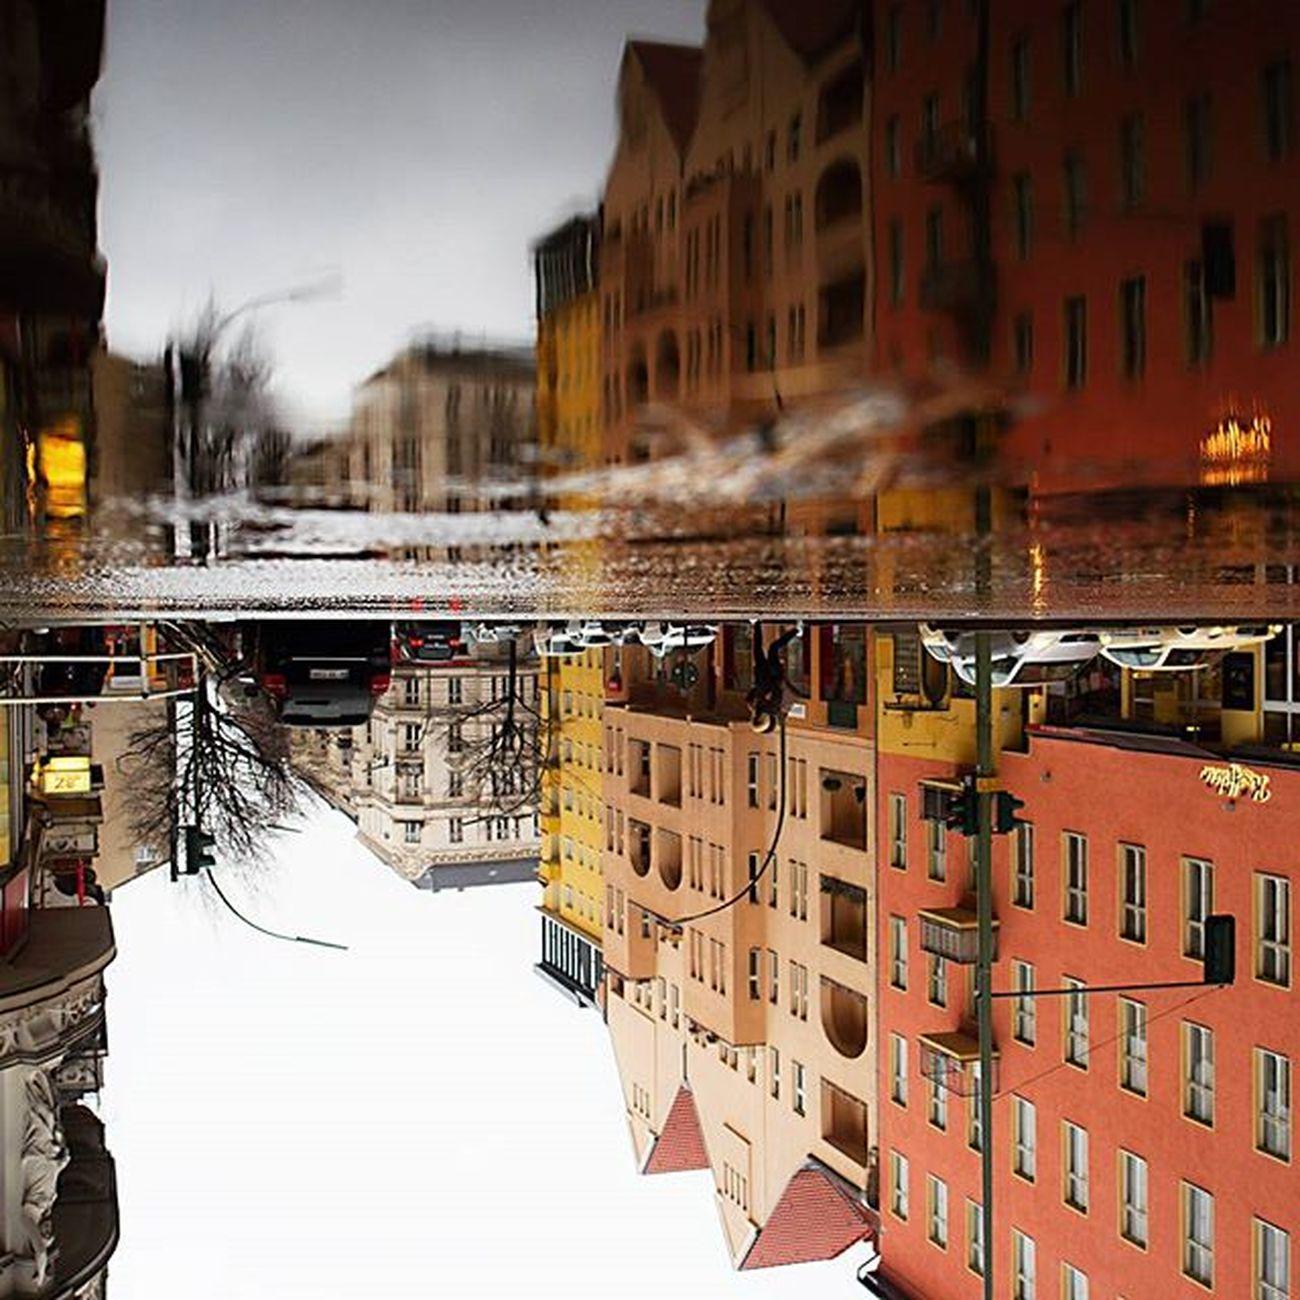 Heute in Schöneberg Berlinschöneberg Berlin Grunewaldstrasse Akazienkiez Puddlegram Berlin_puddle Streetsofberlin